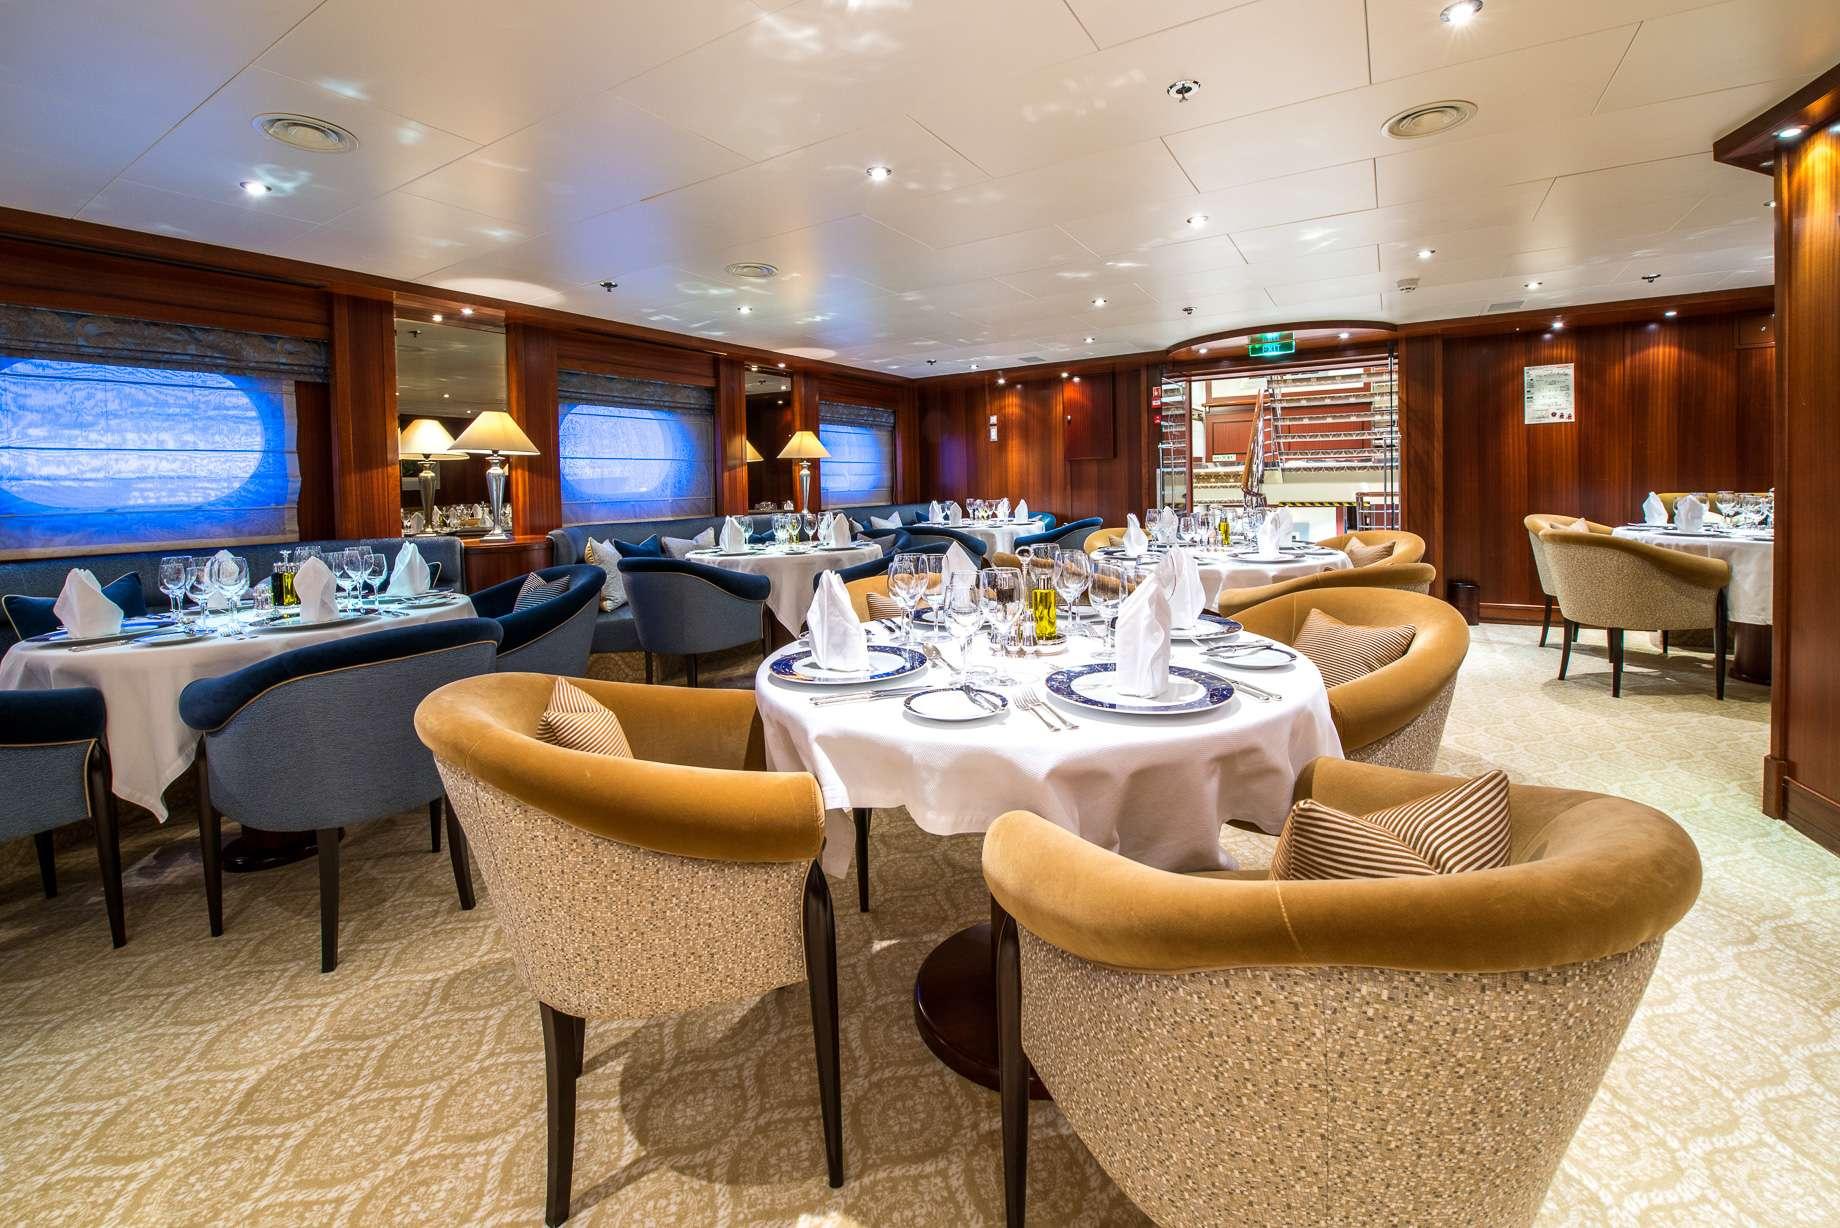 Motor Yacht 'LAUREN L' Dining Area, 40 PAX, 295.00 Ft, 90.00 Meters, Built 2002, Cassens Werft, Refit Year 2008/2015